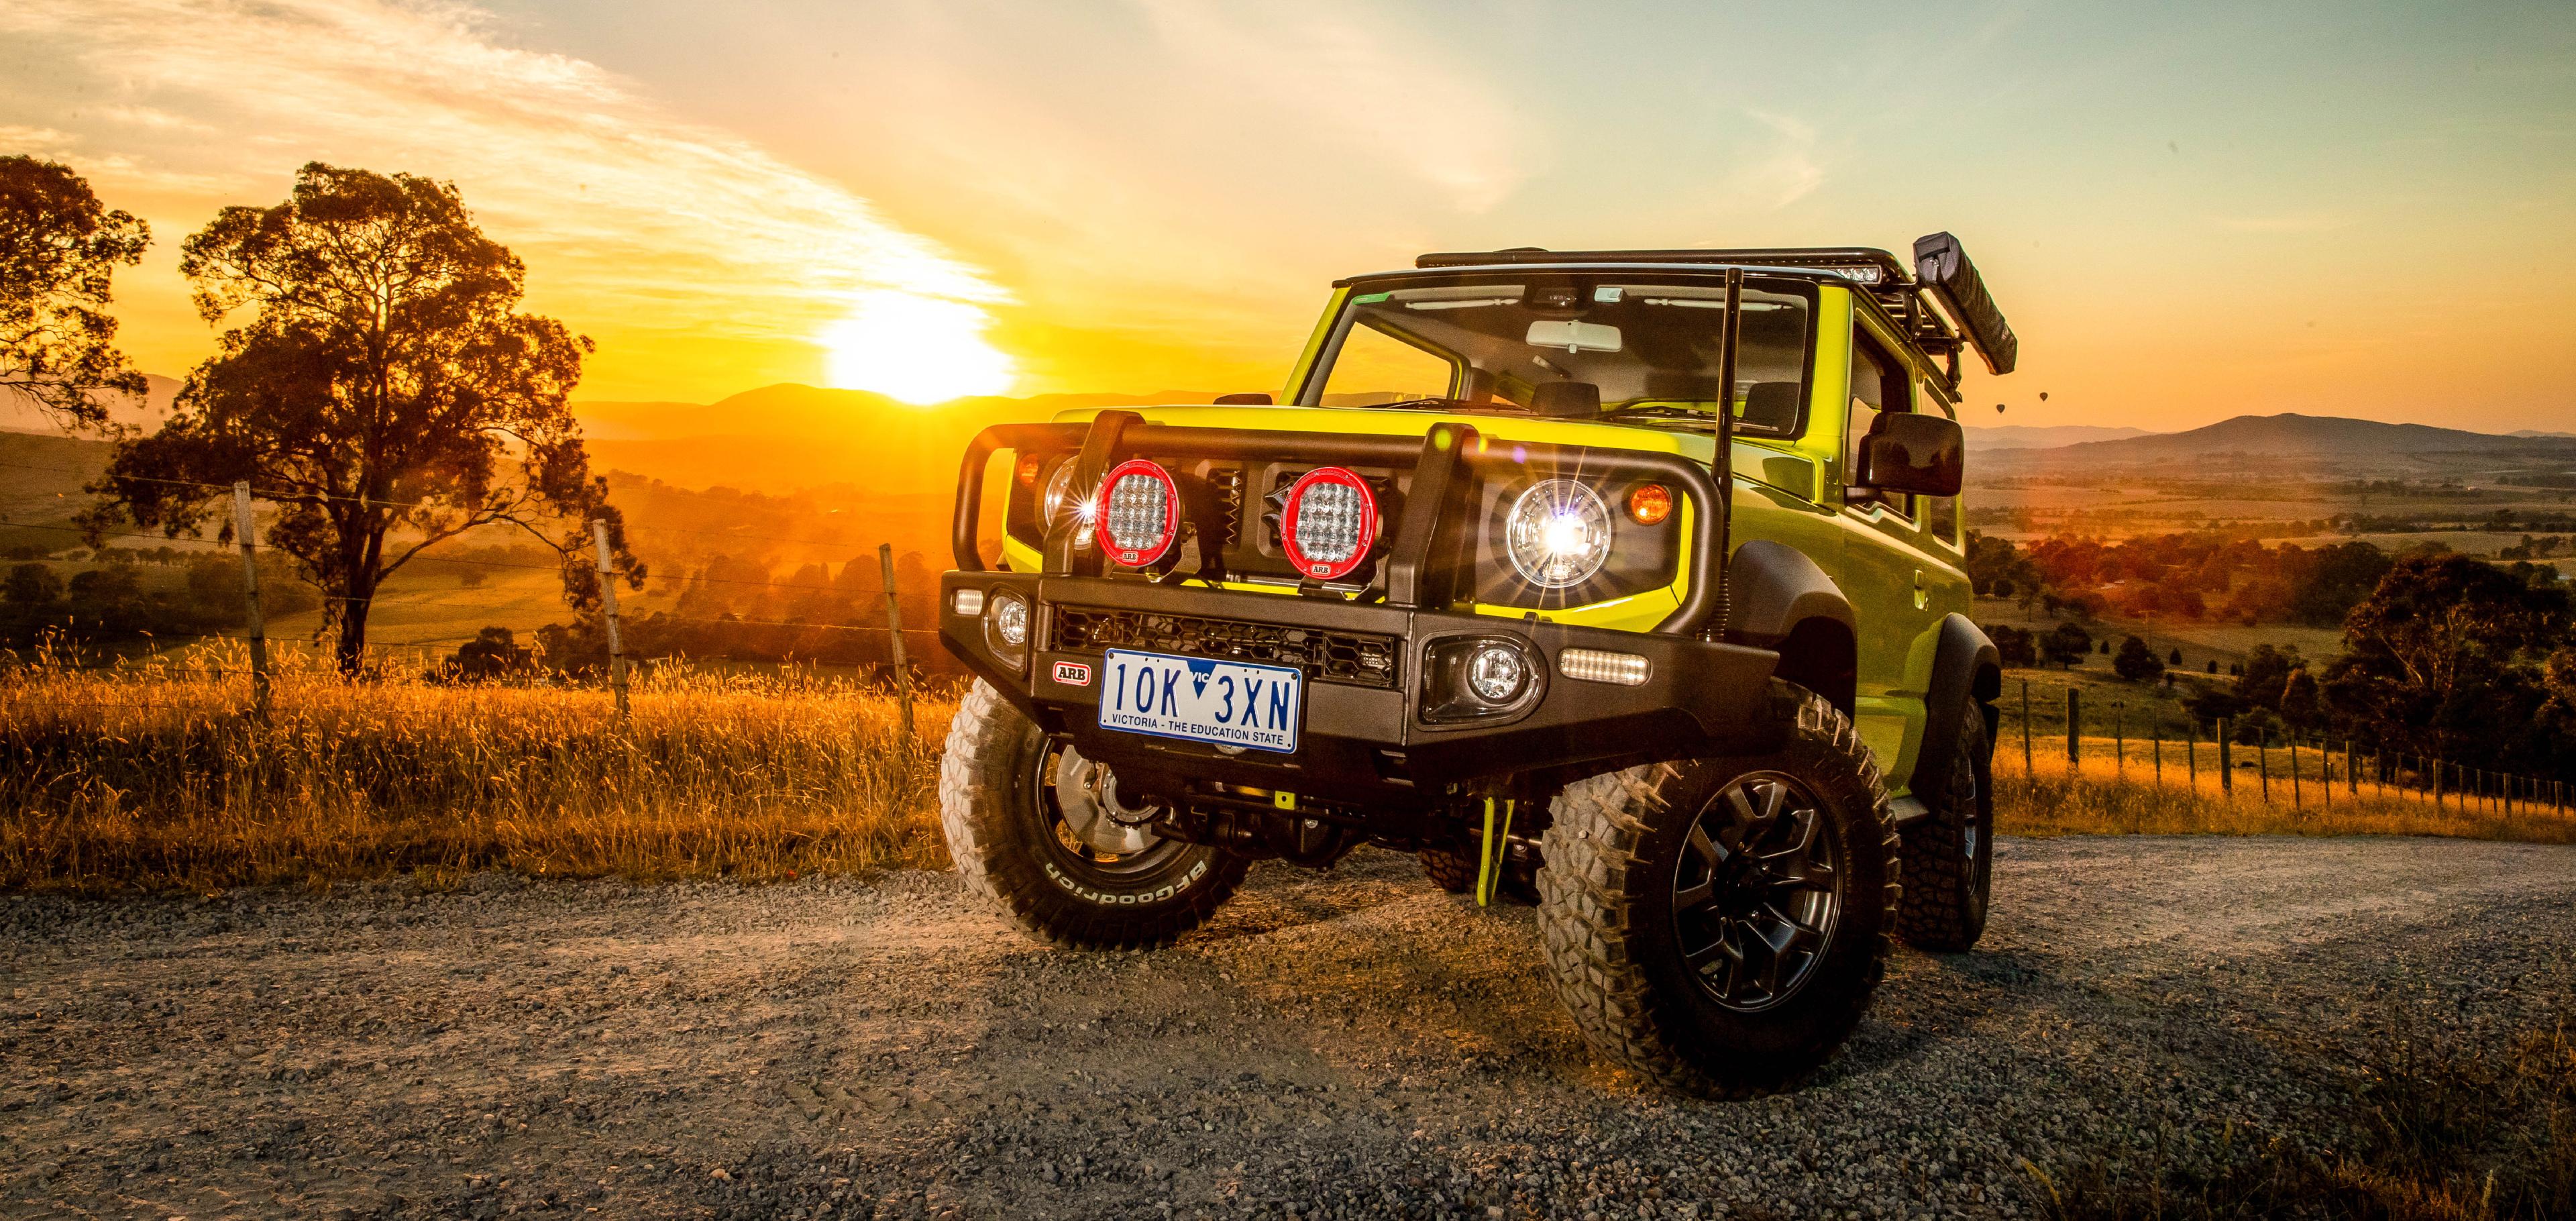 Arb 4 215 4 Accessories Suzuki Jimny 2019 Present Arb